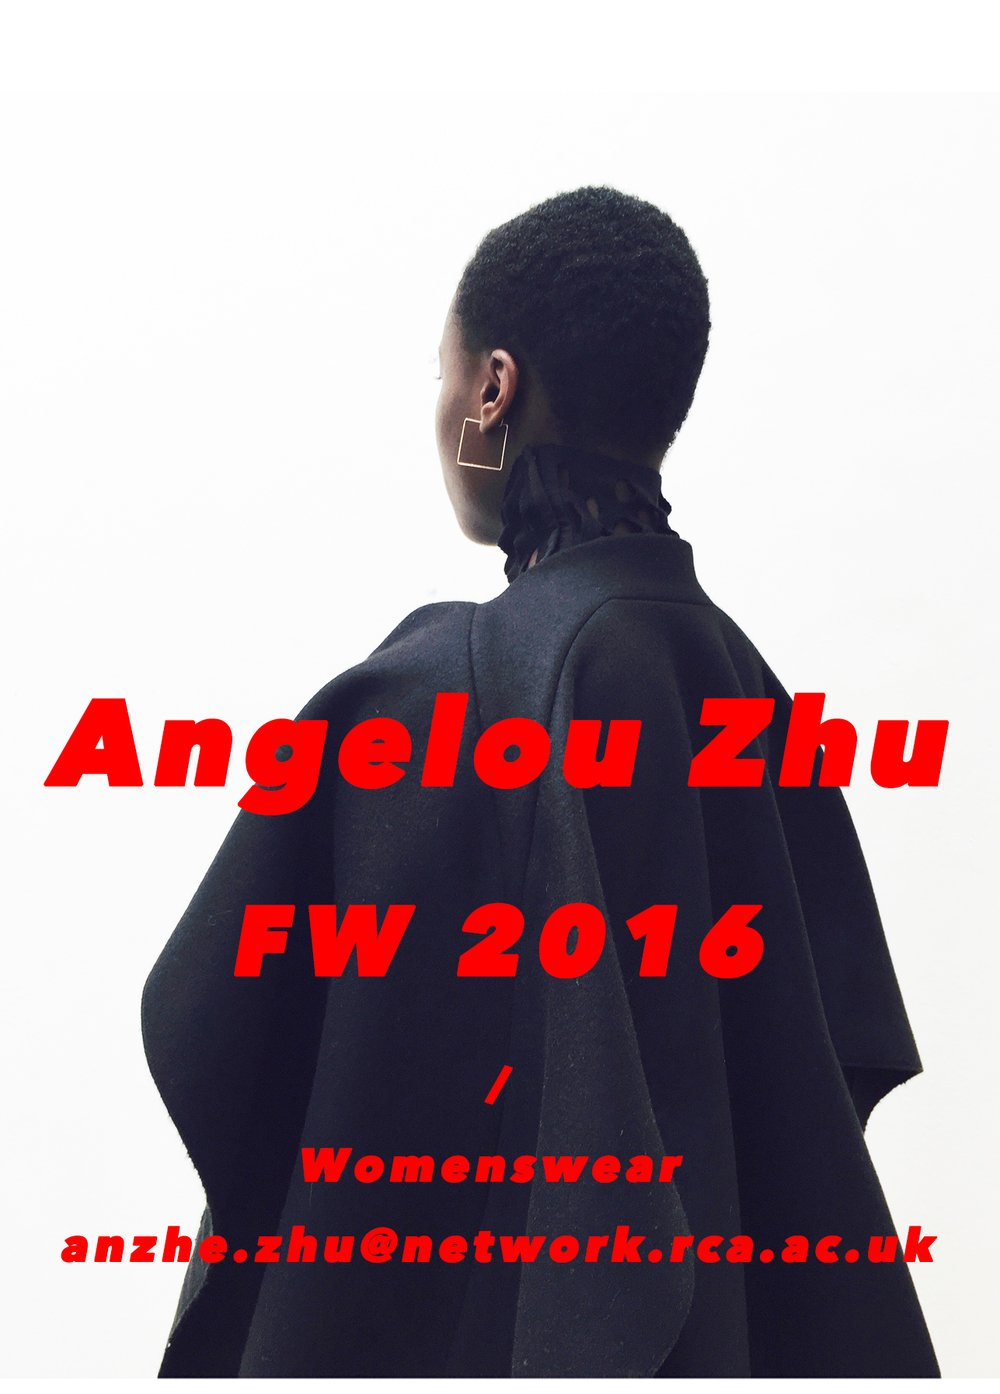 Angelou Zhu